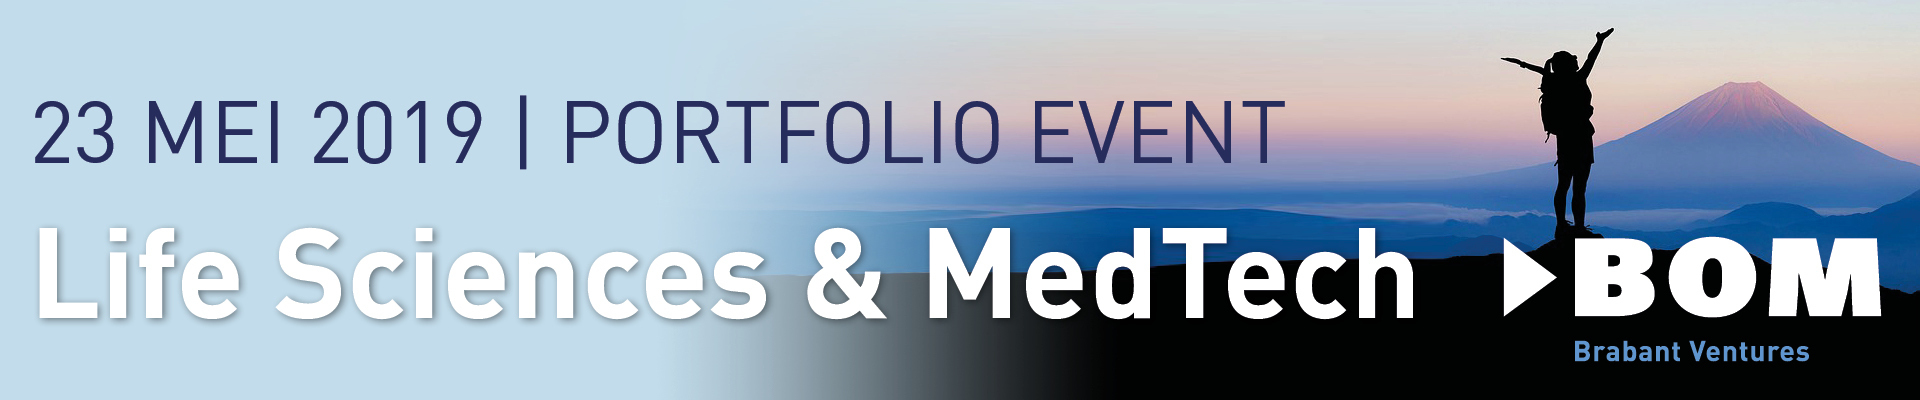 LSMT portfolio event